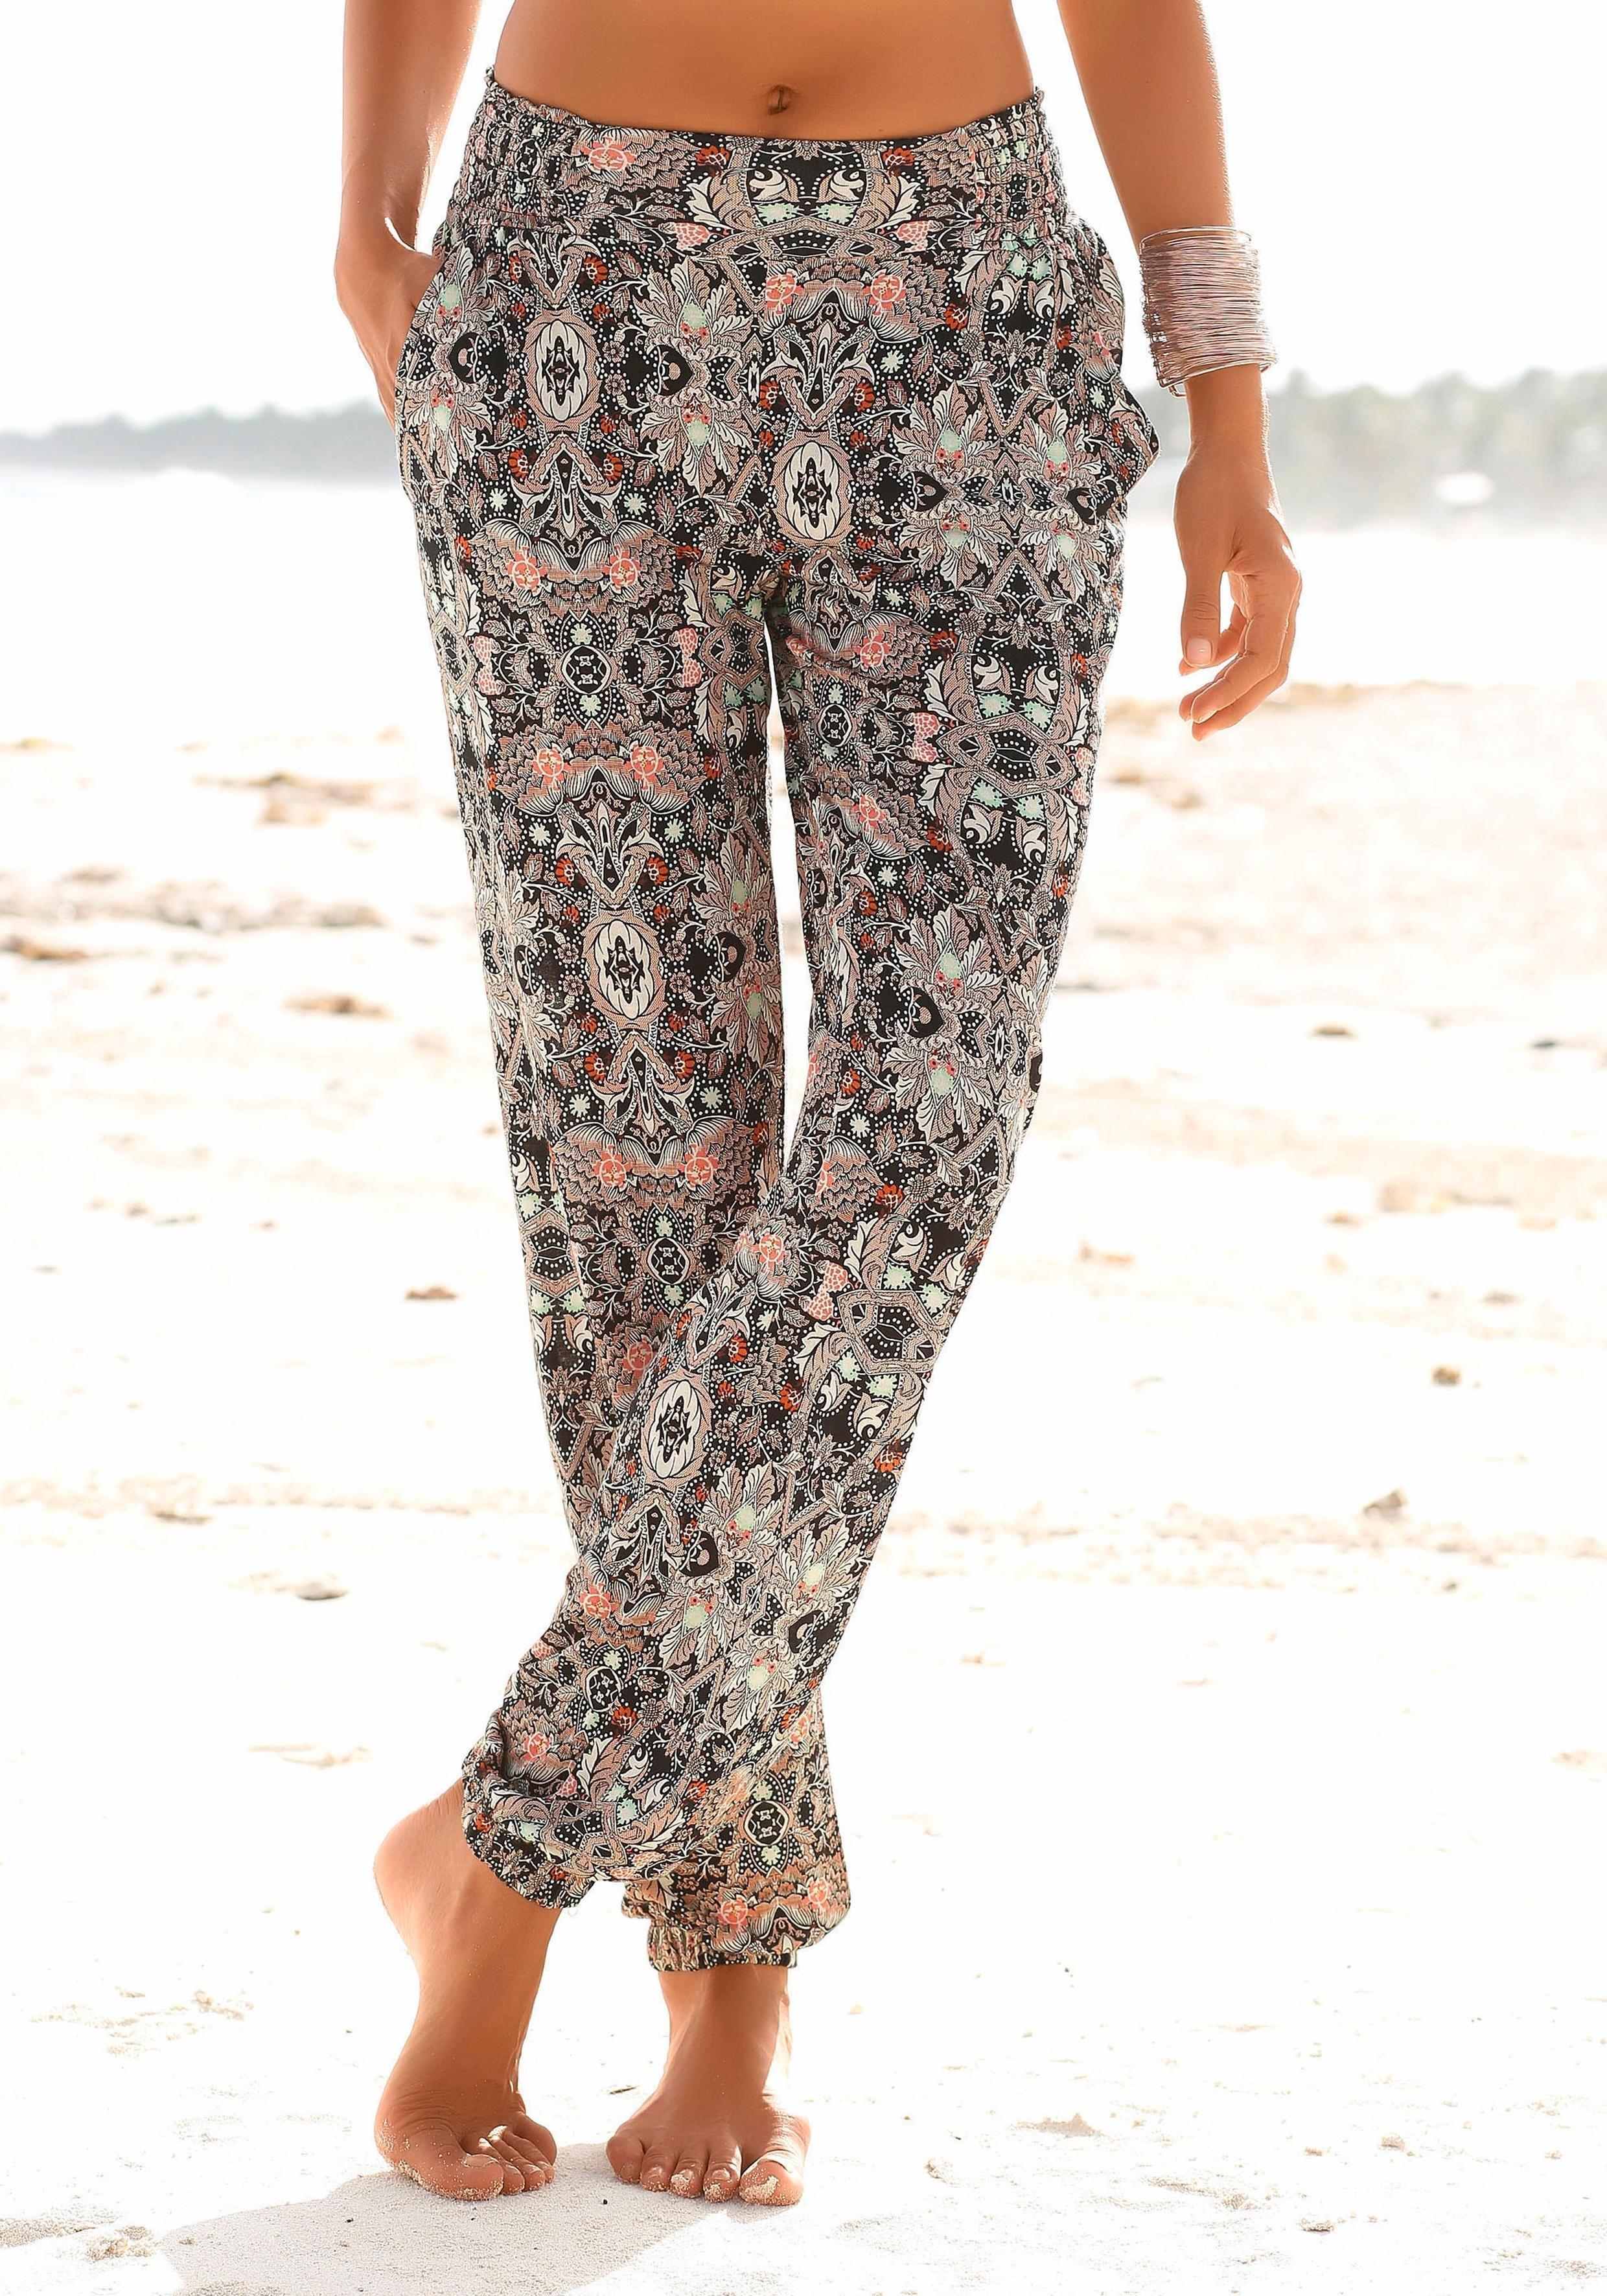 s.Oliver Beachwear s.Oliver RED LABEL Beachwear strandbroek online kopen op lascana.nl